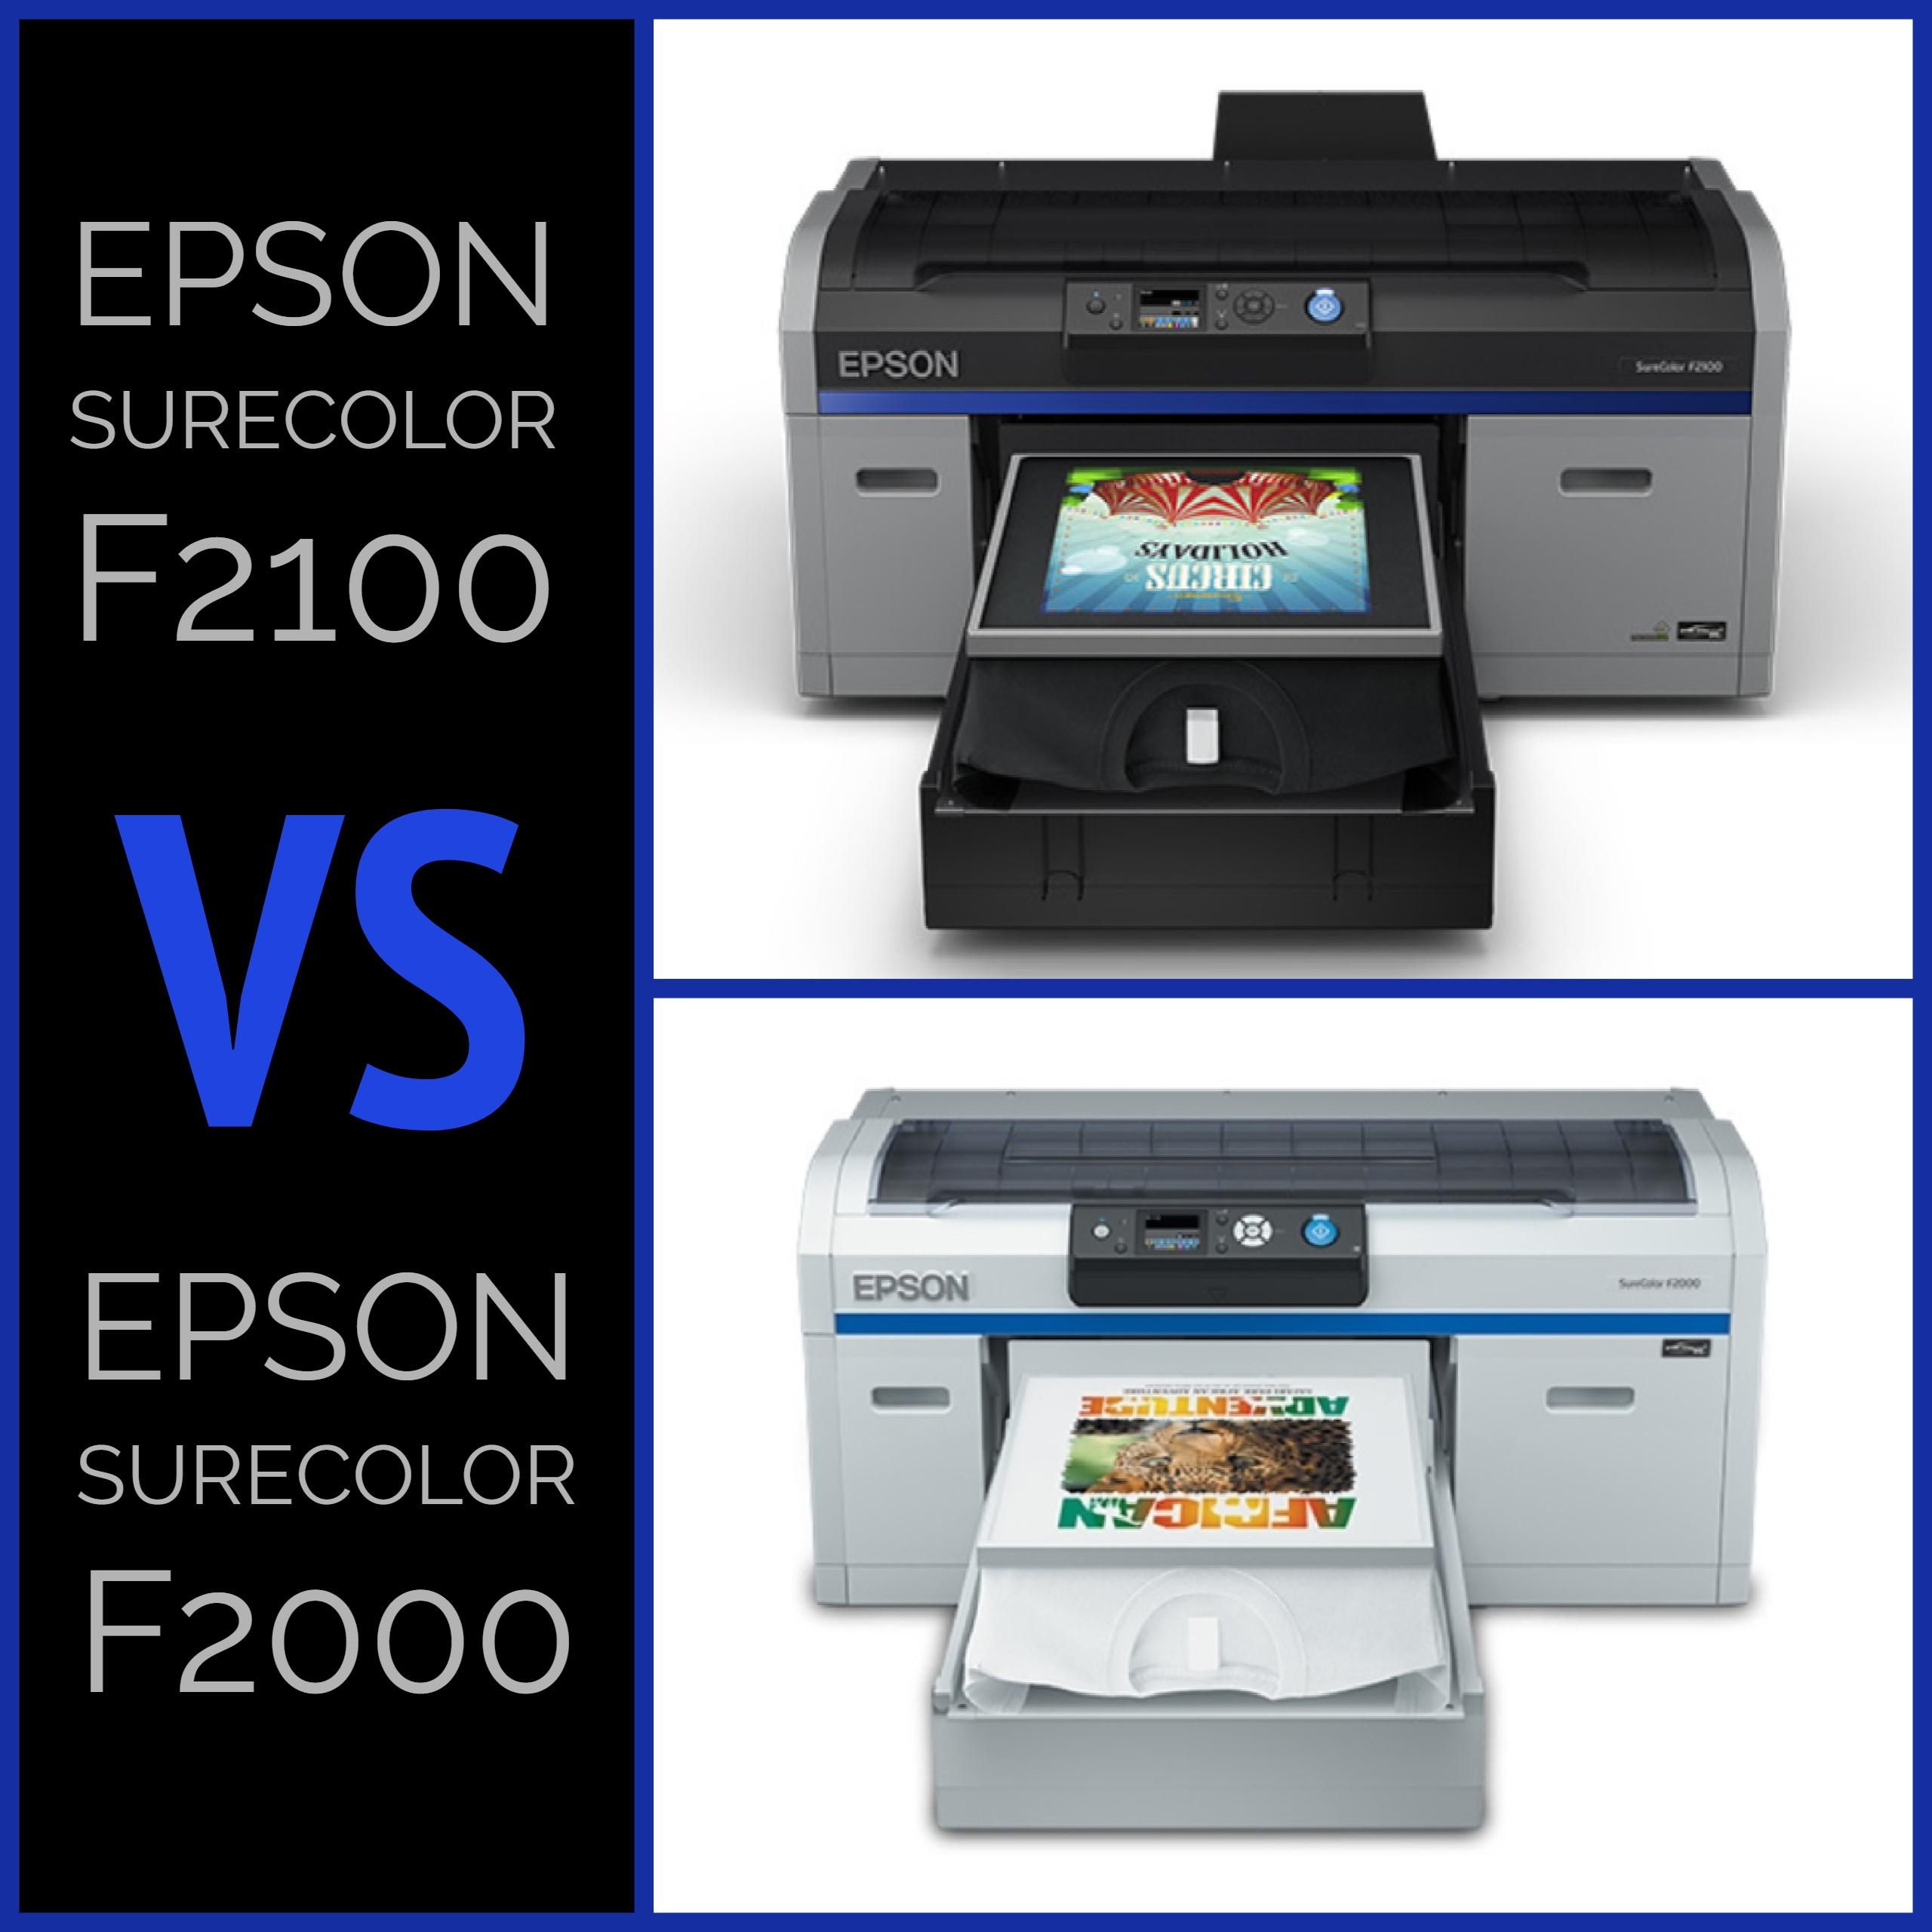 sc f2100 price epson surecolor f2000 price